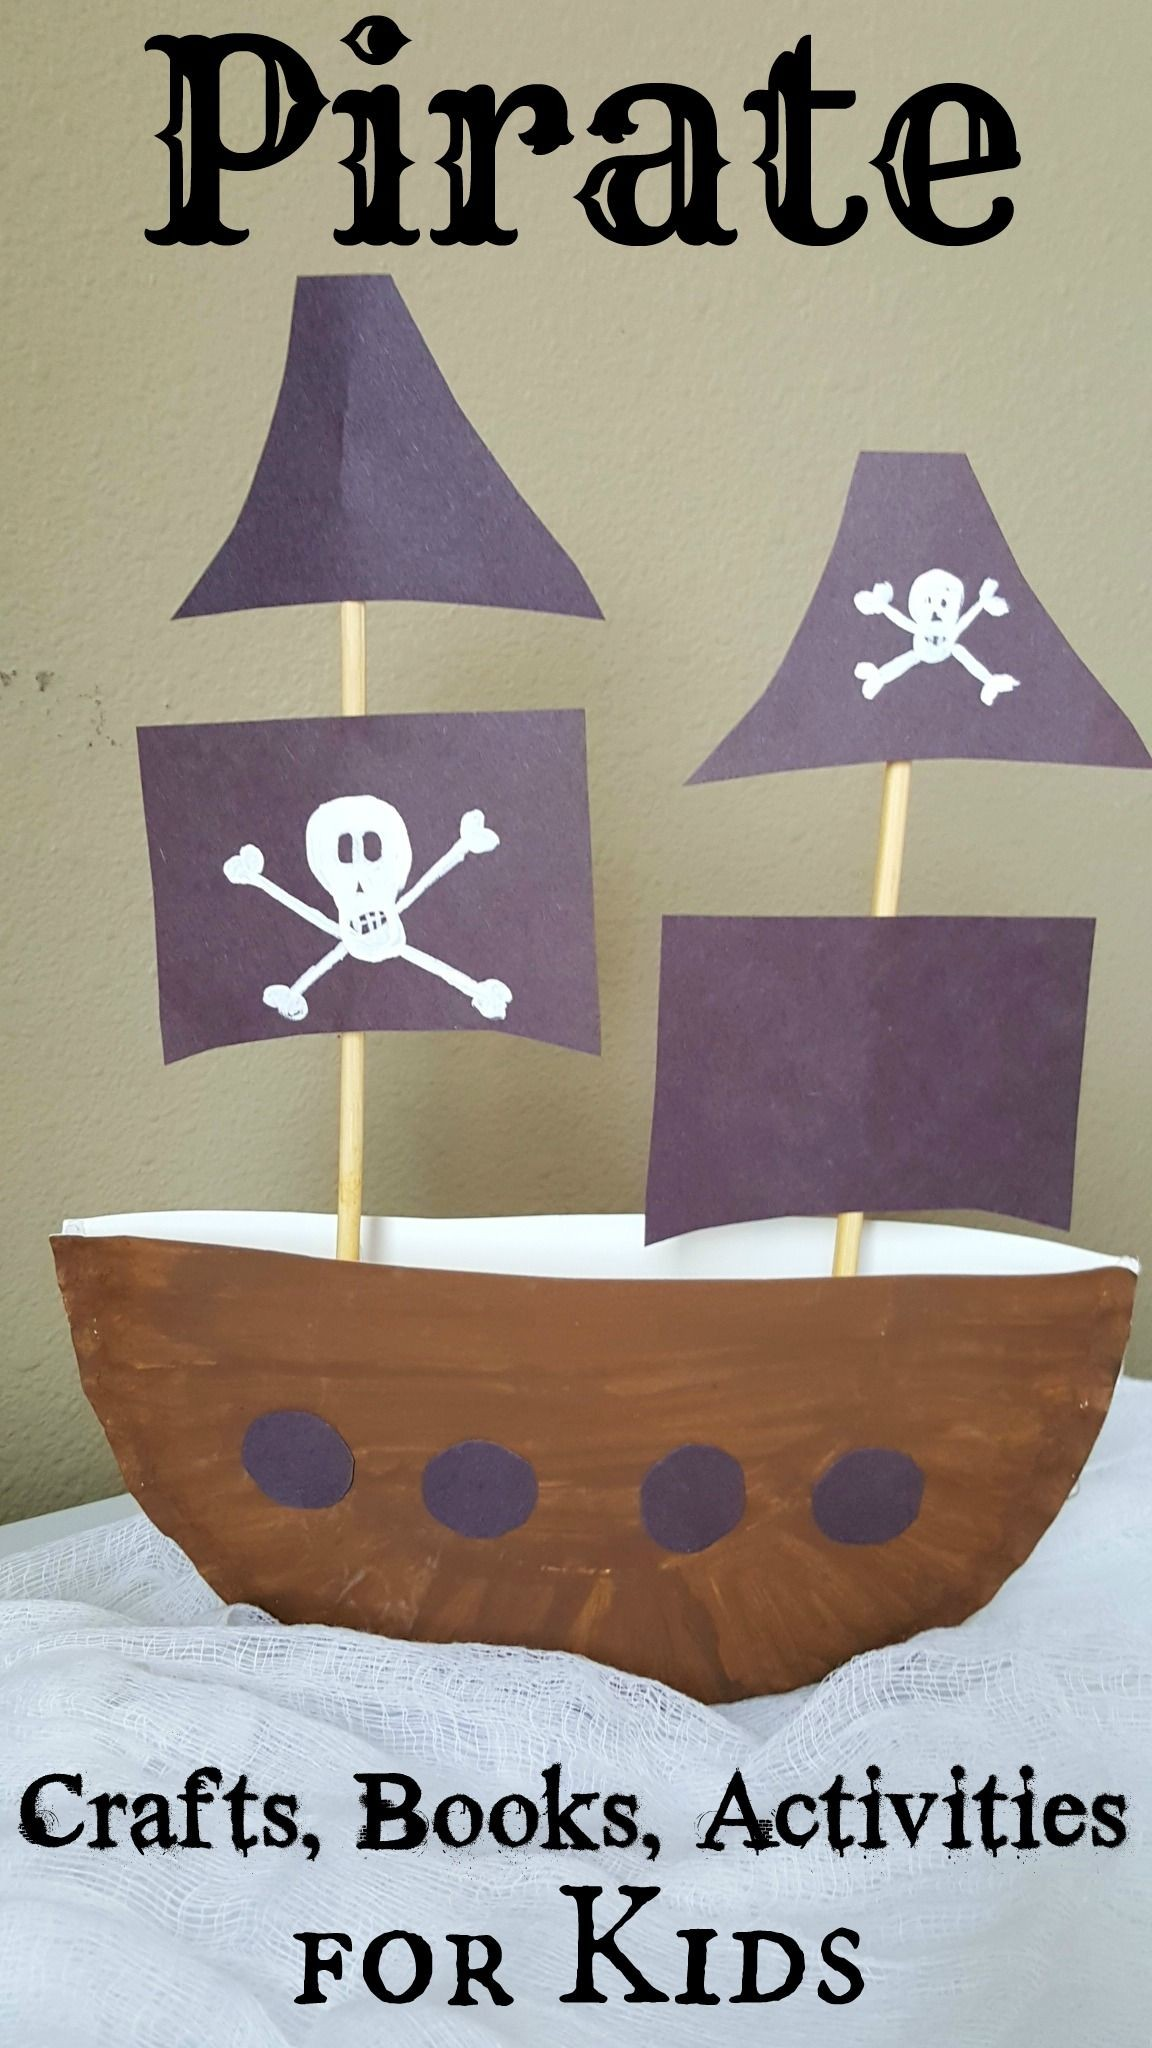 Printable Pirate Ship Papercraft